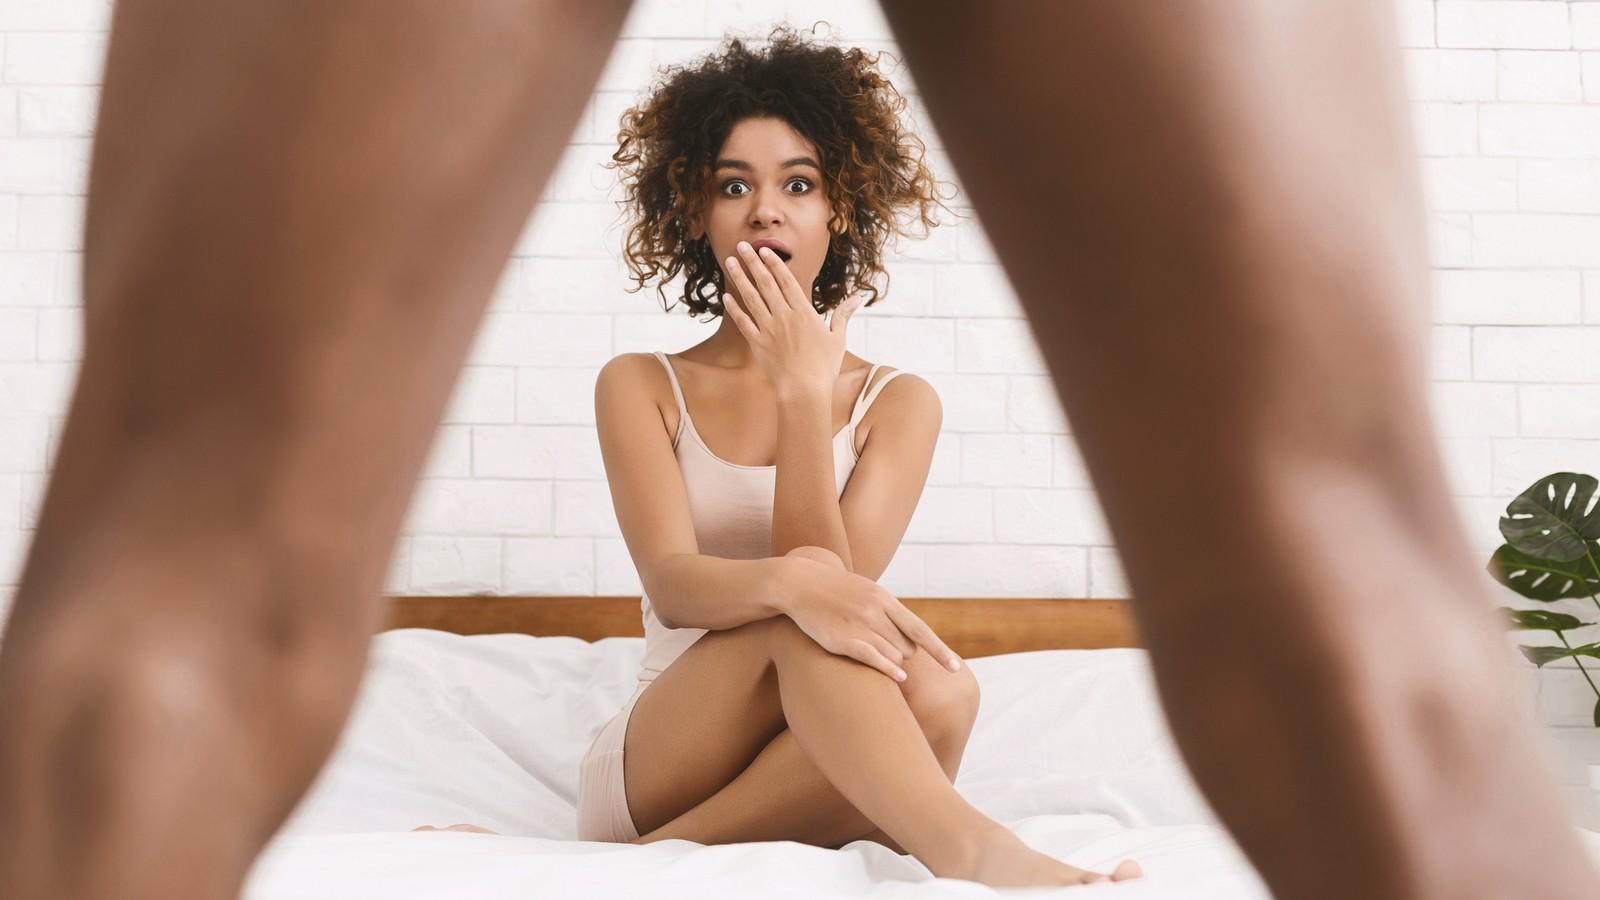 Steif penis länger Penisgrößen im